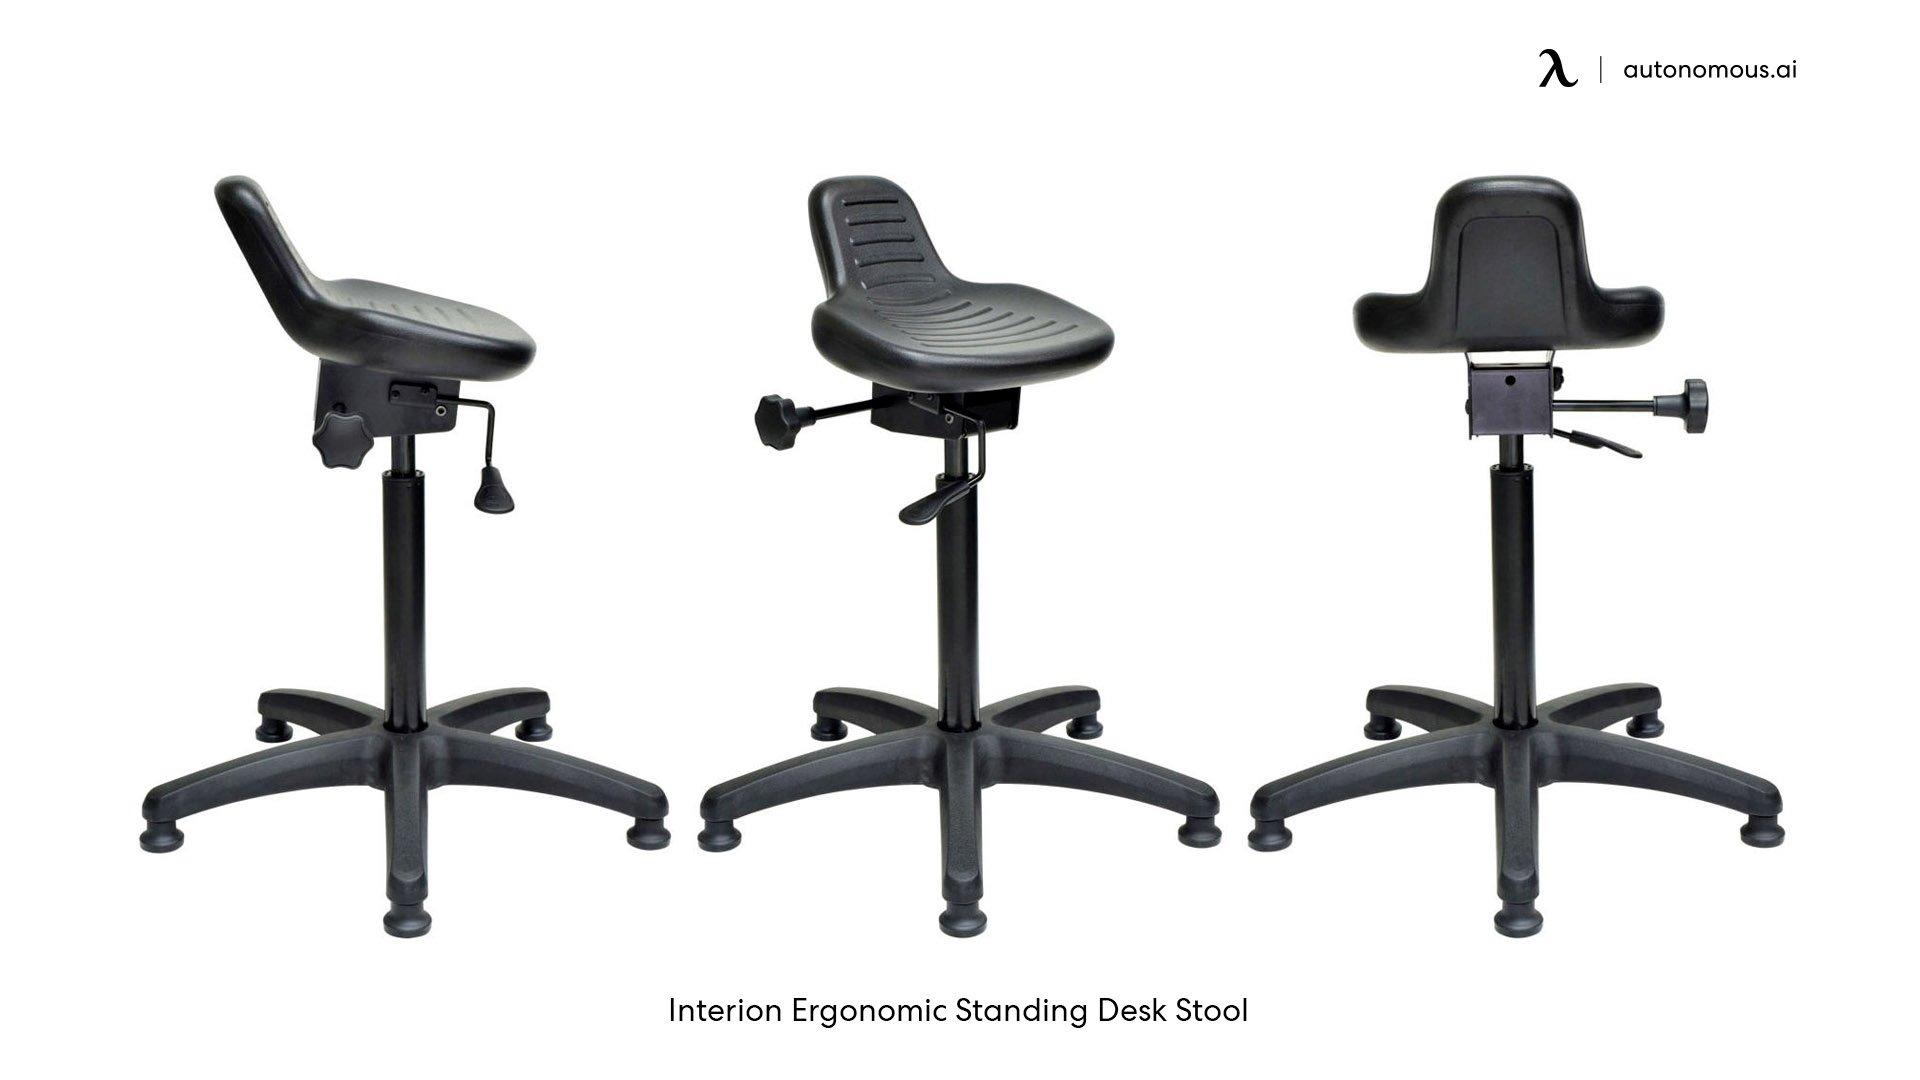 Backrest of ergonomic saddle chair